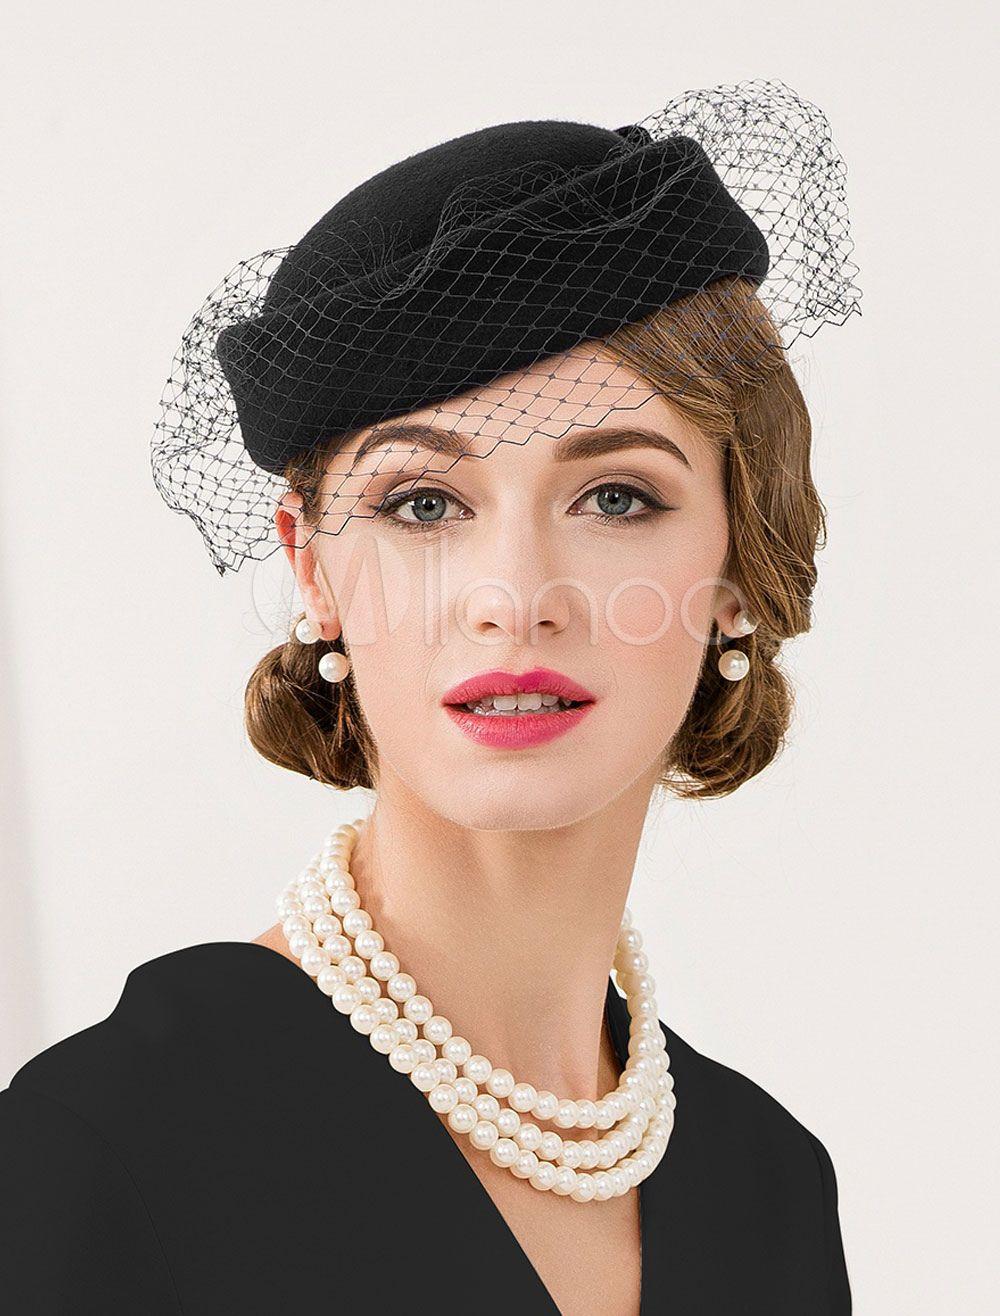 f0feb986cfb223 Vintage Wool Hat Royal Blue Bowknot Women's Flapper Fascinator Halloween -  Milanoo.com